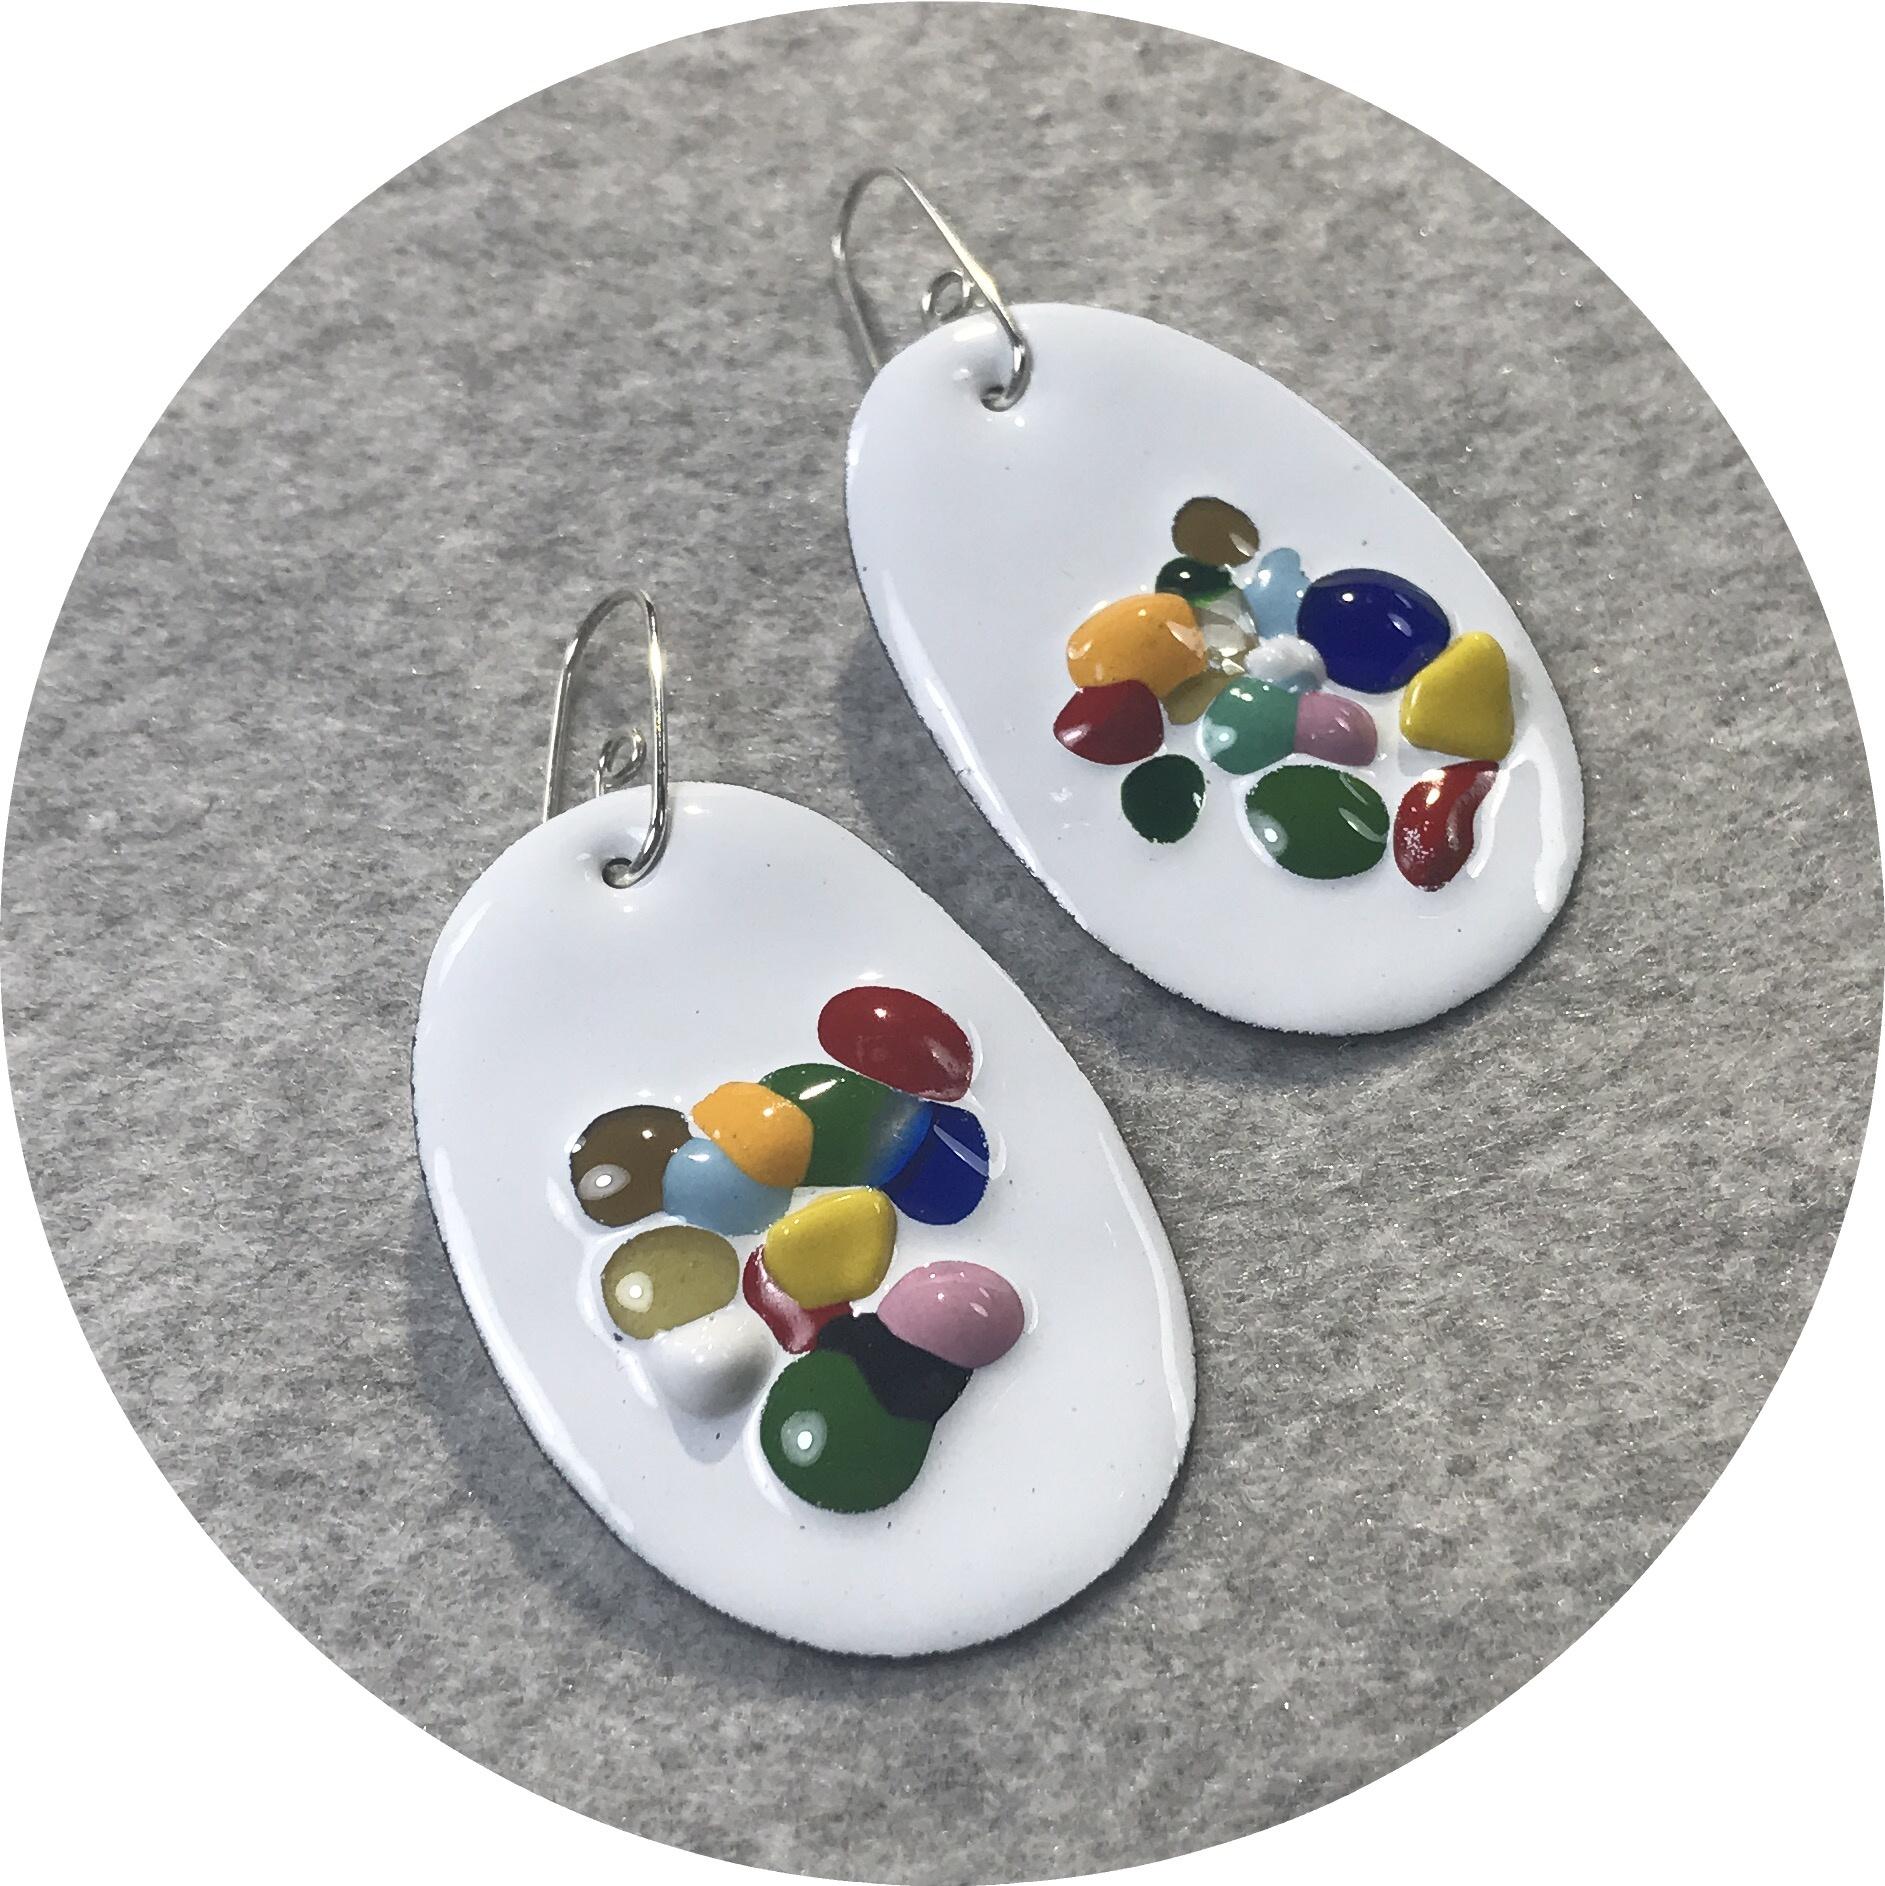 Jenna O'Brien - Medium Queenie Earrings in white enamel featuring colourful flecks